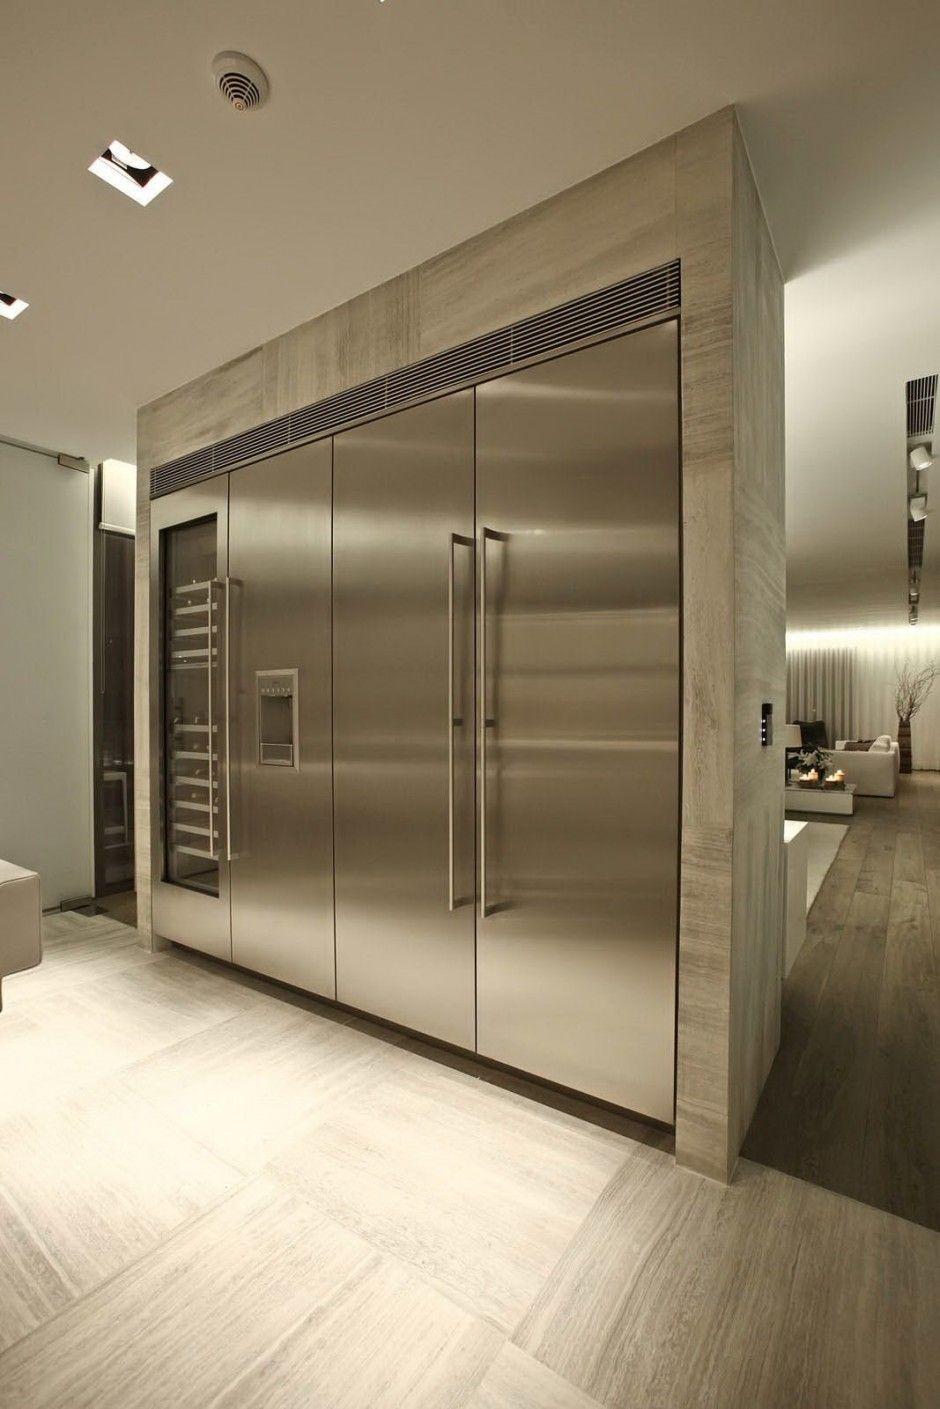 refrigerator wall | I need one | Pinterest | Cucine, Cucina e Cucine ...